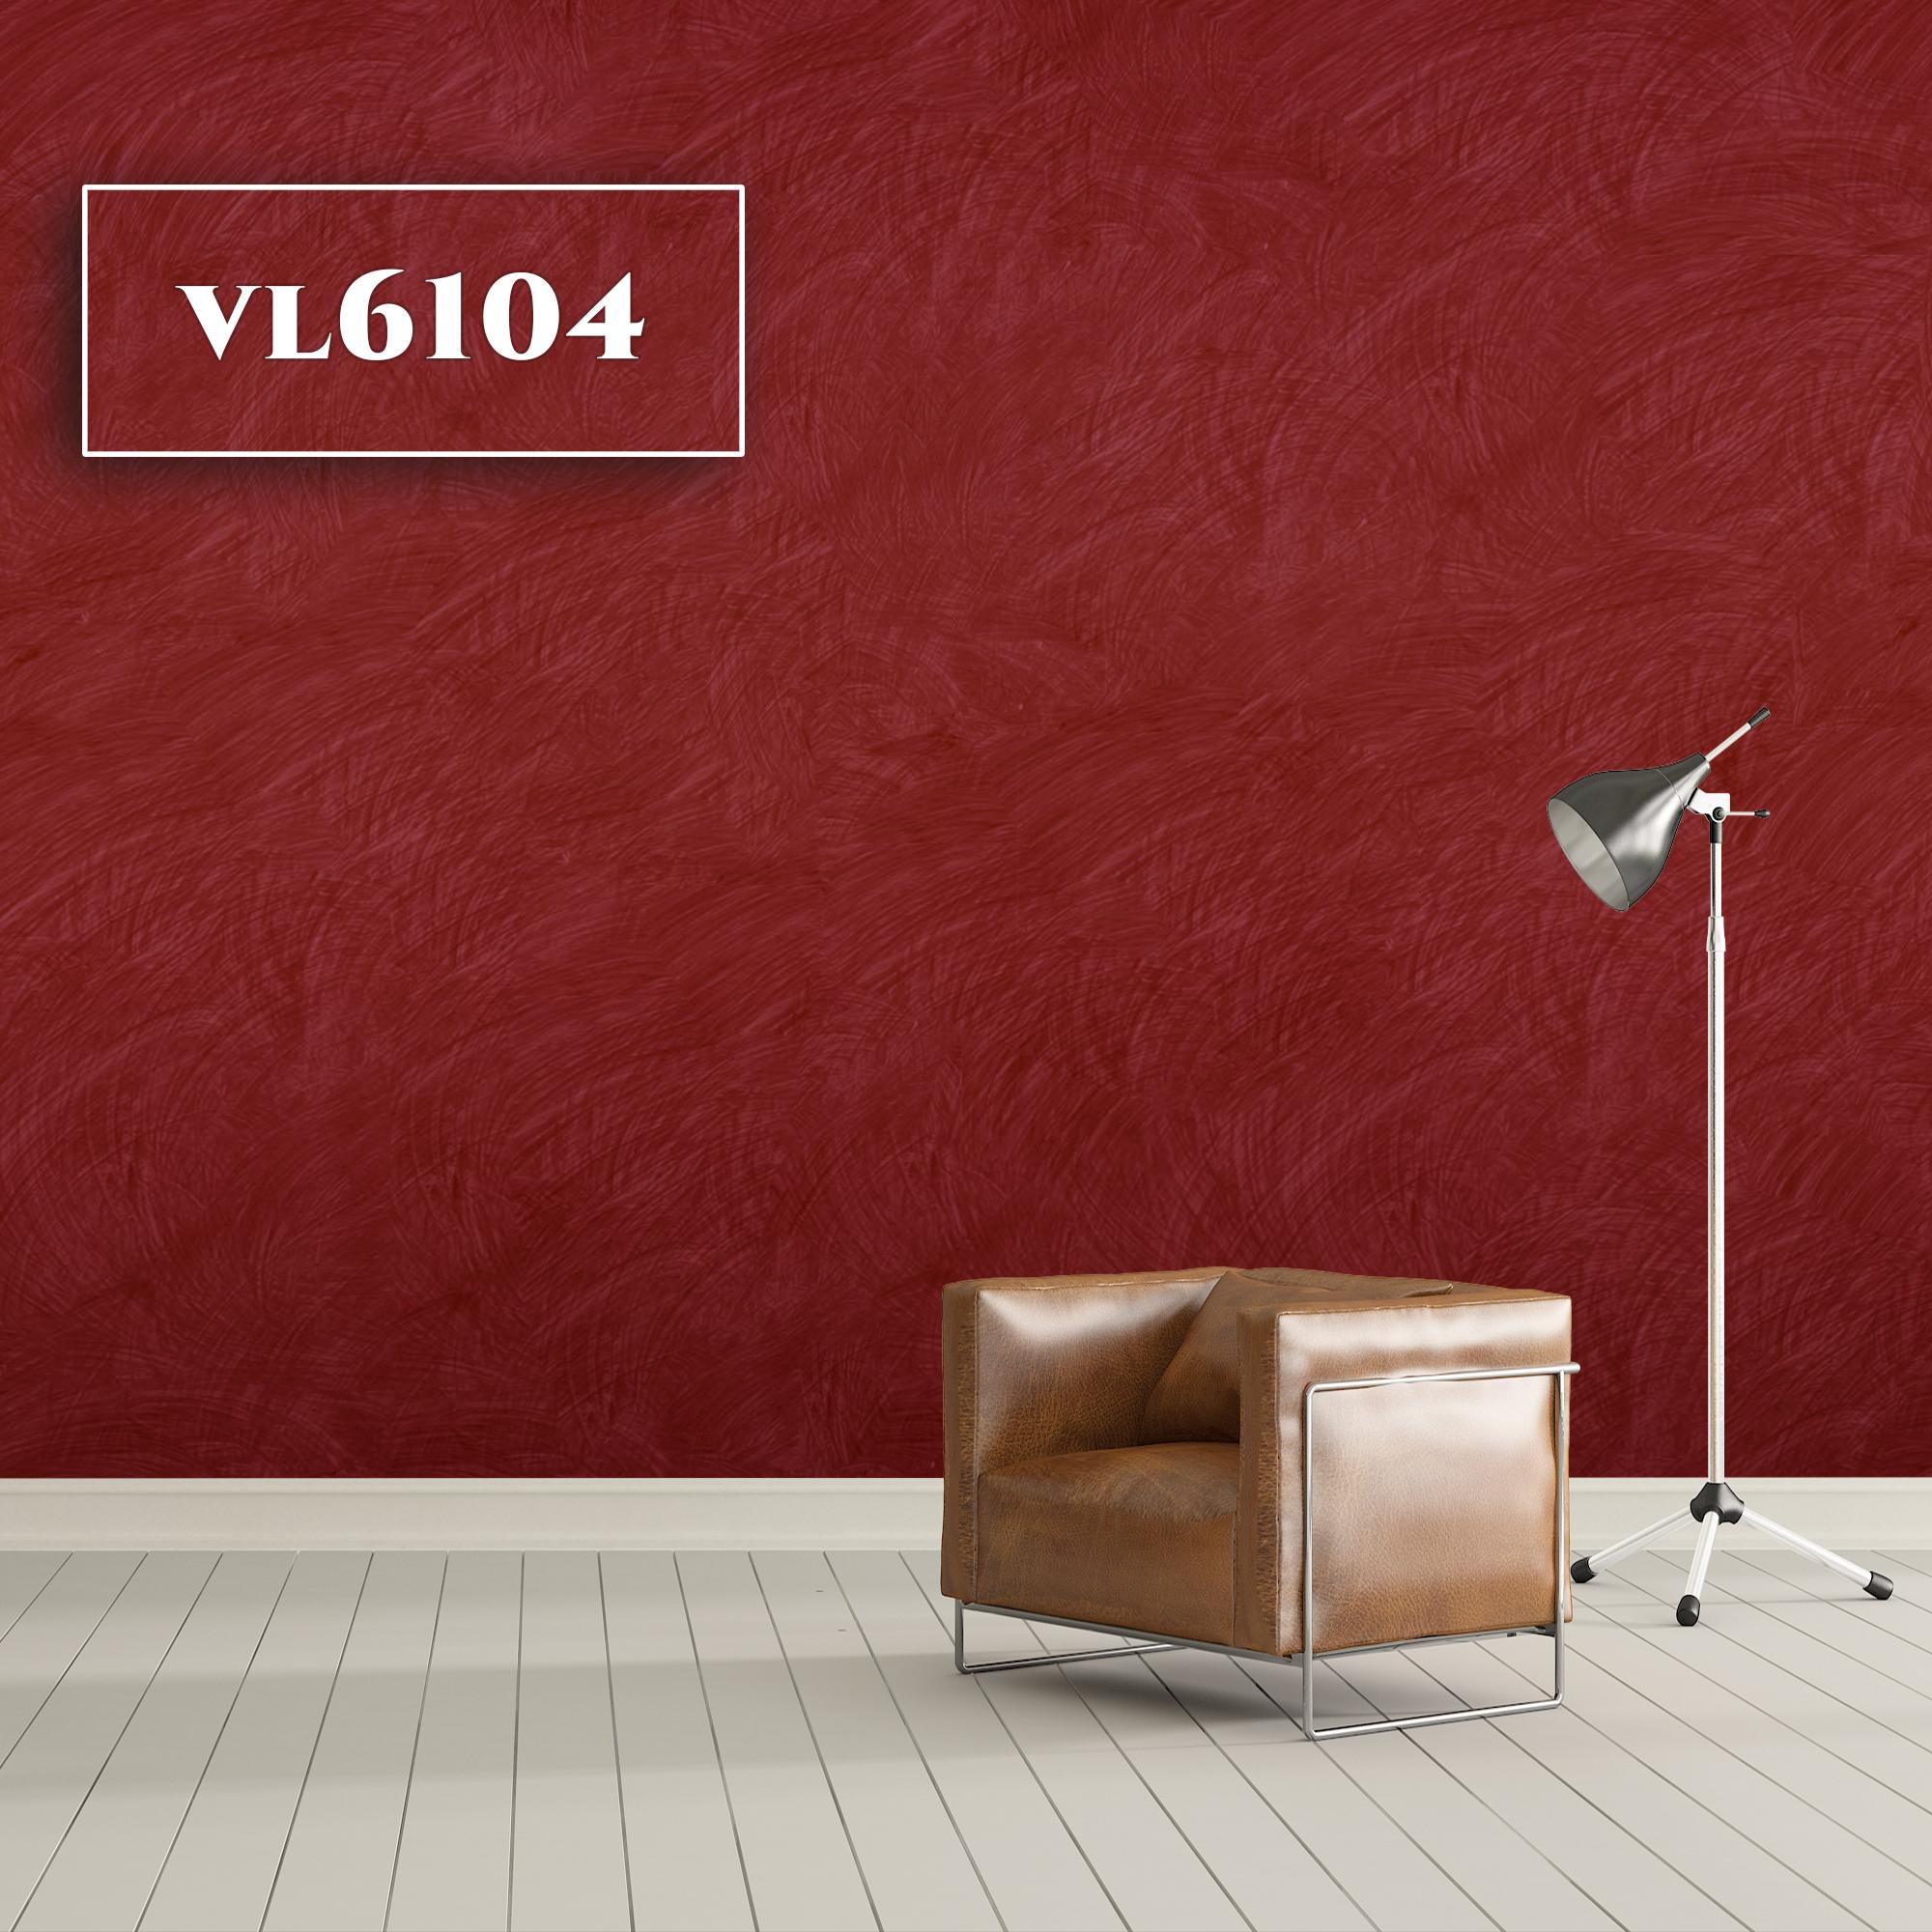 VL6104